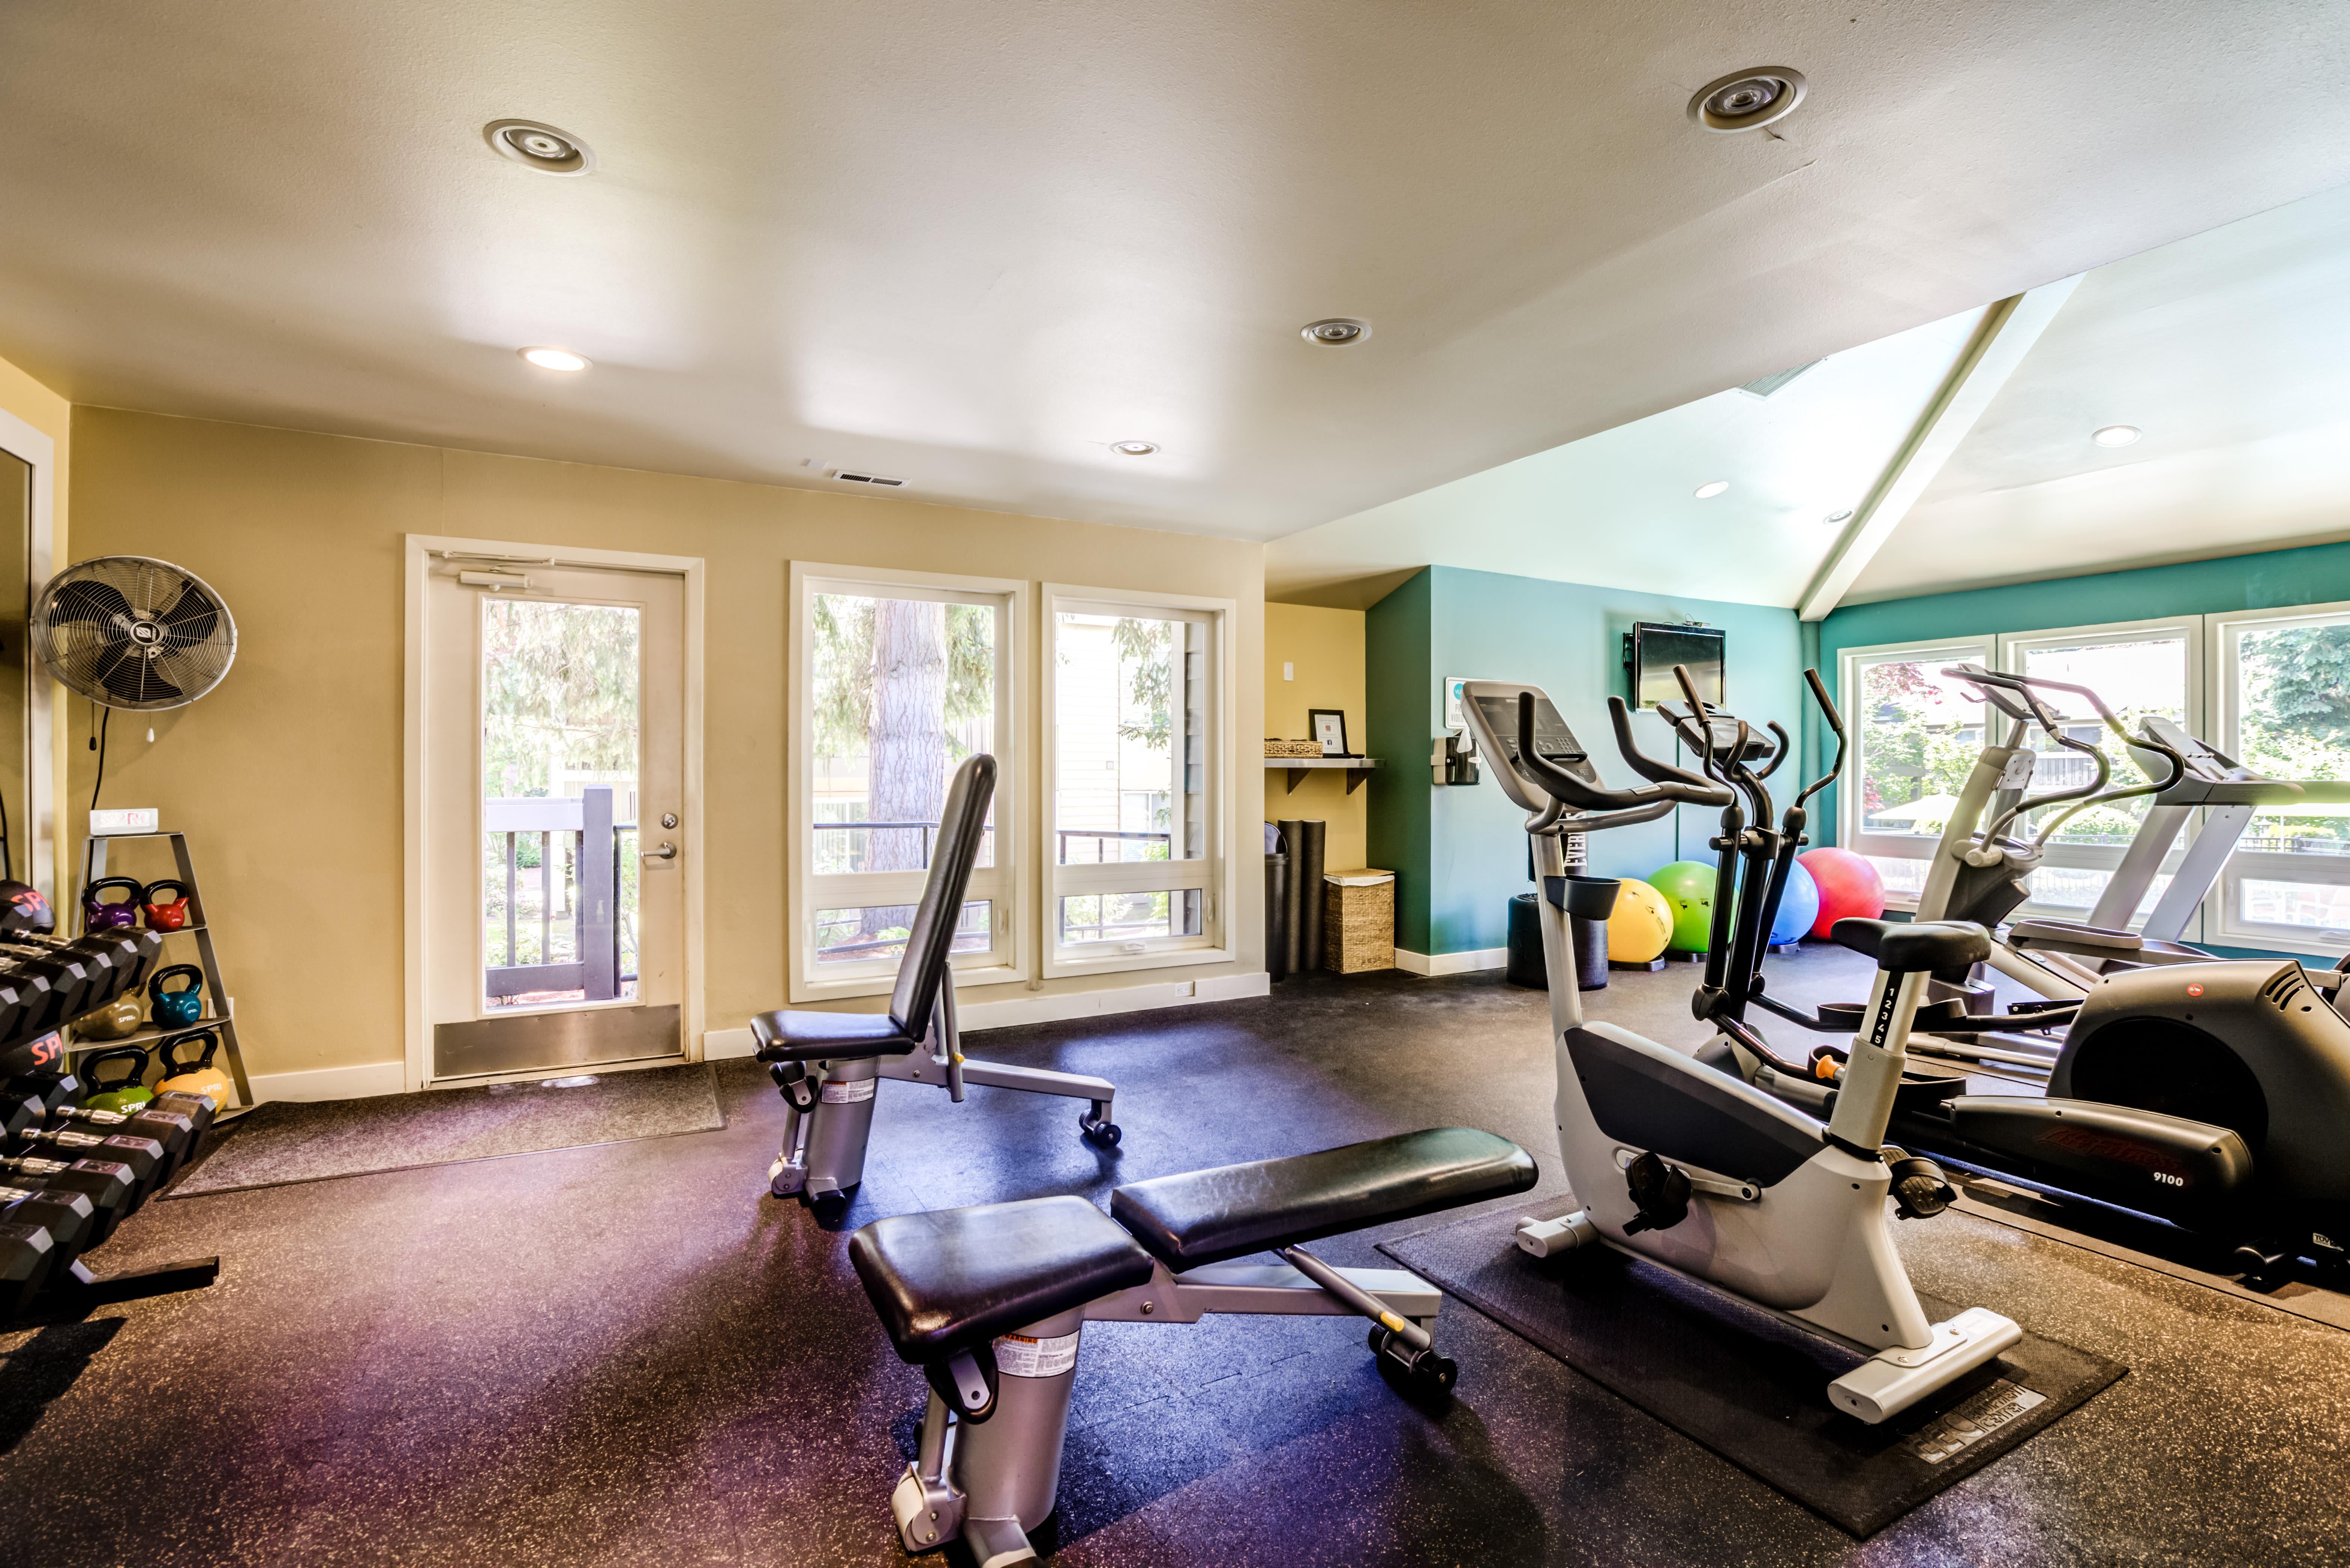 Gym at Vue Kirkland Apartments in Kirkland, Washington